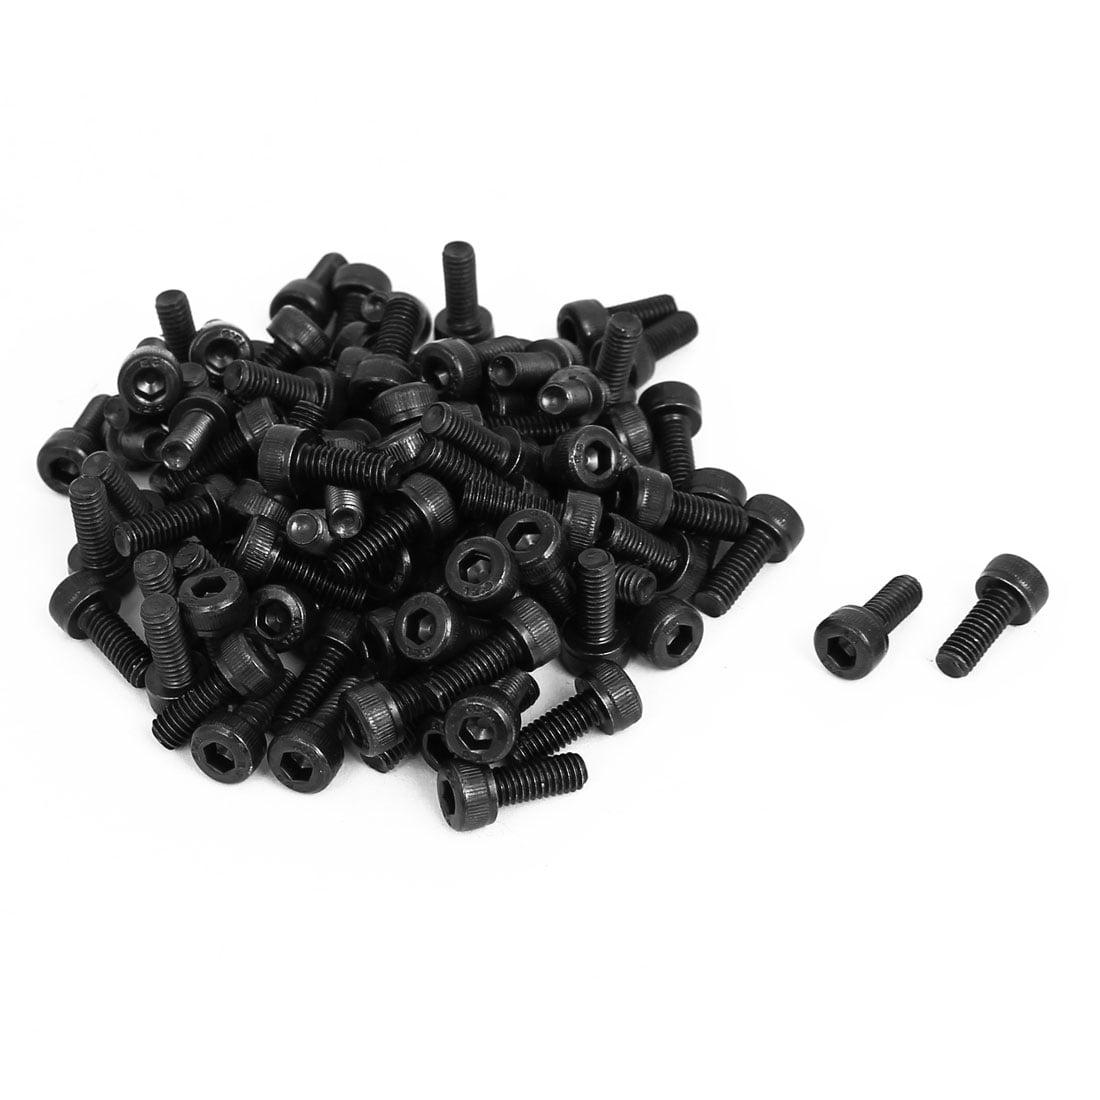 Unique Bargains M4x10mm Alloy Steel Hex Bolt Socket Head Cap Machine Screws Black 100pcs